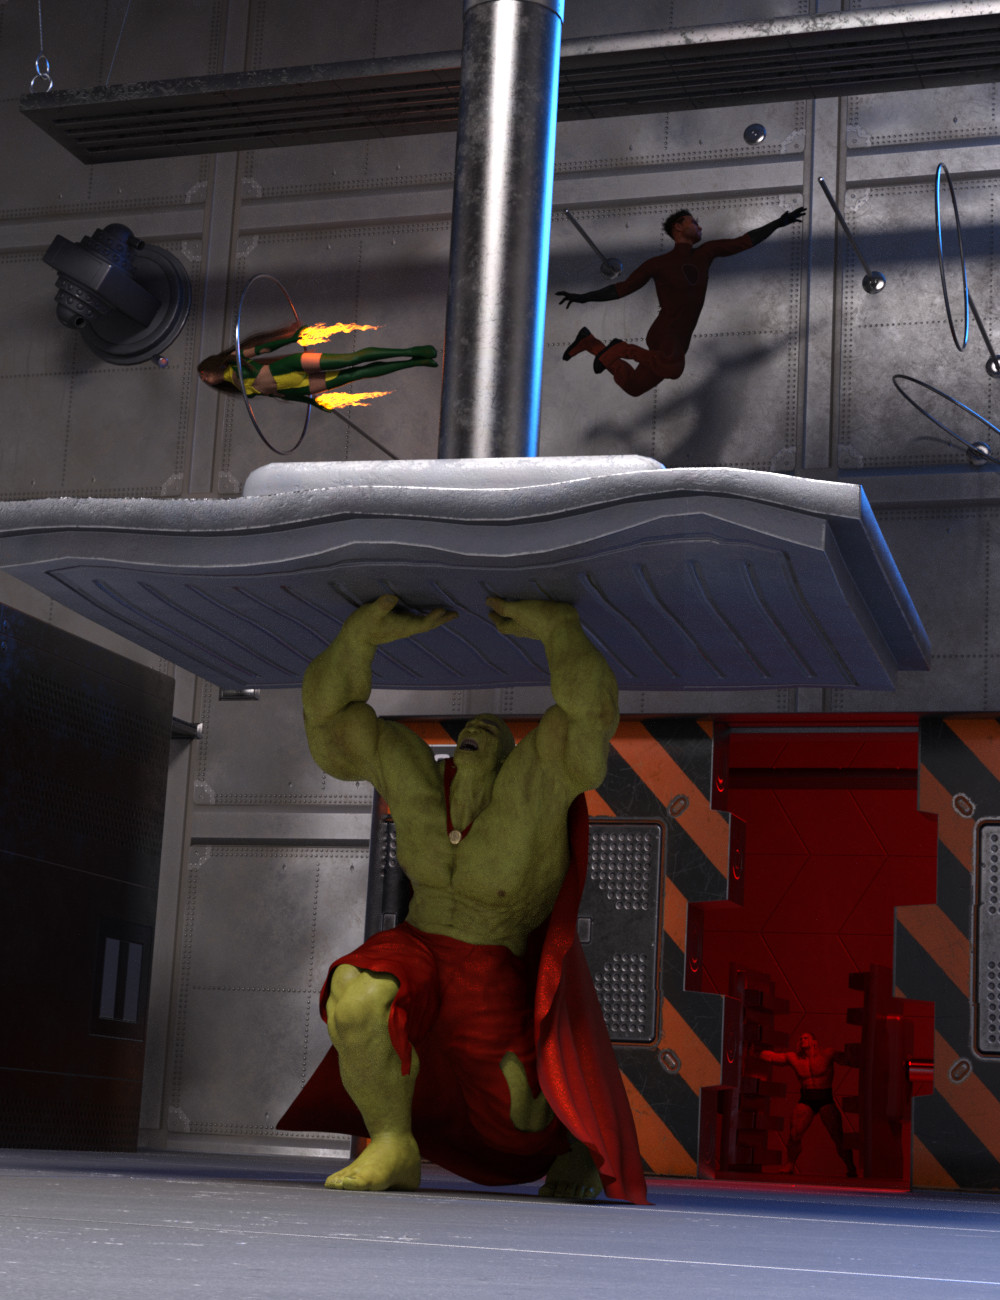 Superhero Training Room by: Silent Winter, 3D Models by Daz 3D